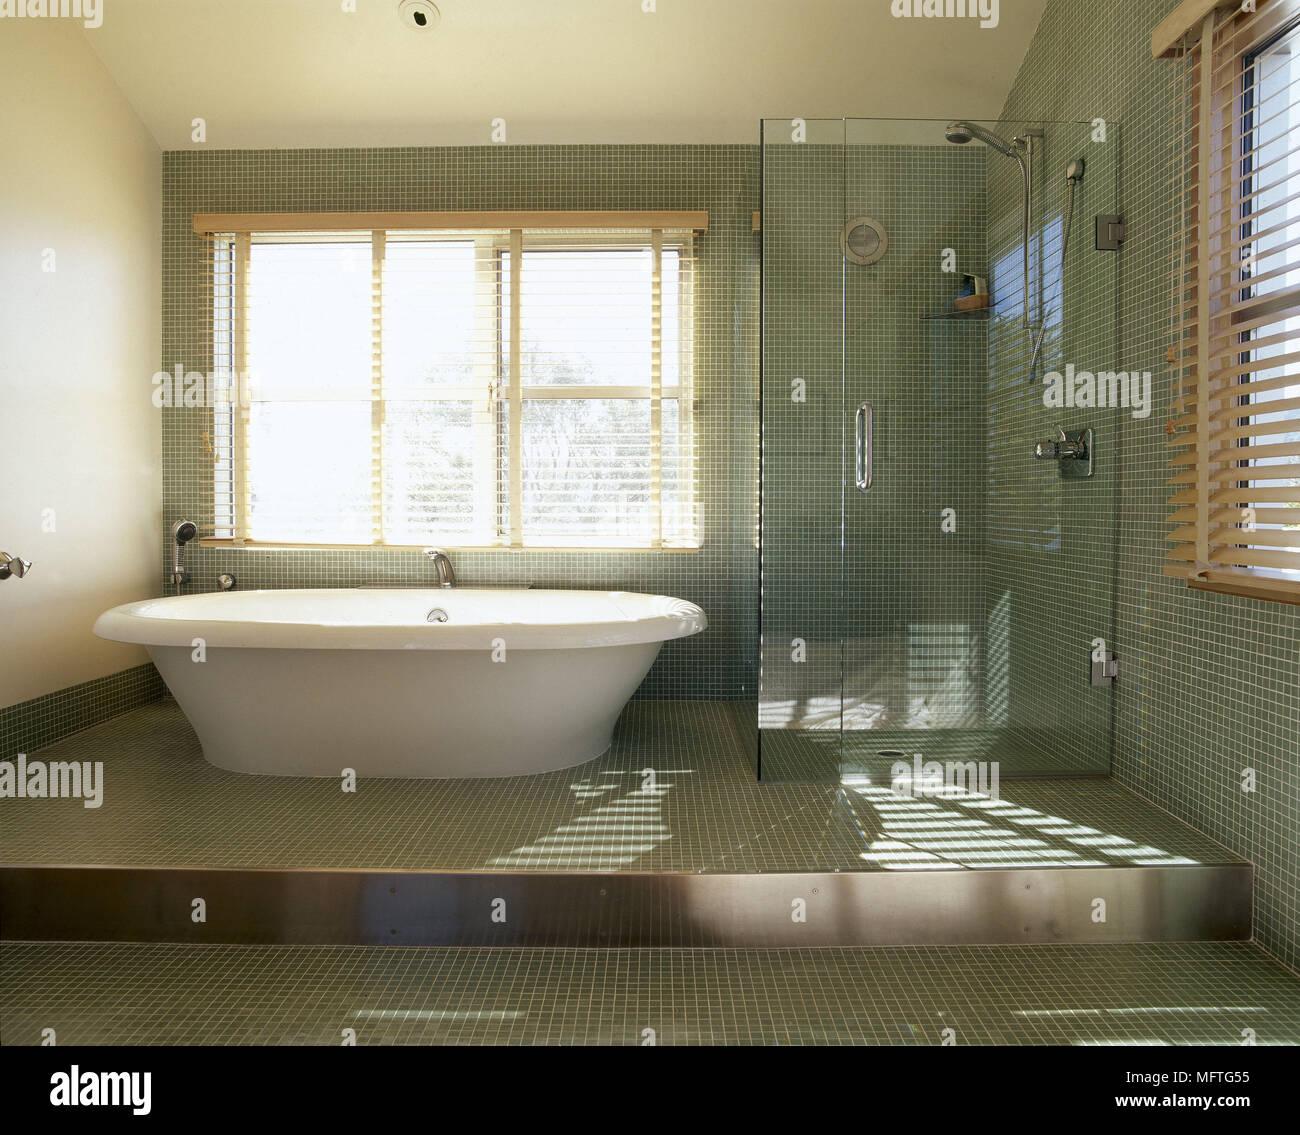 Modern bathroom free standing bath mosaic tiled flor walls shower ...